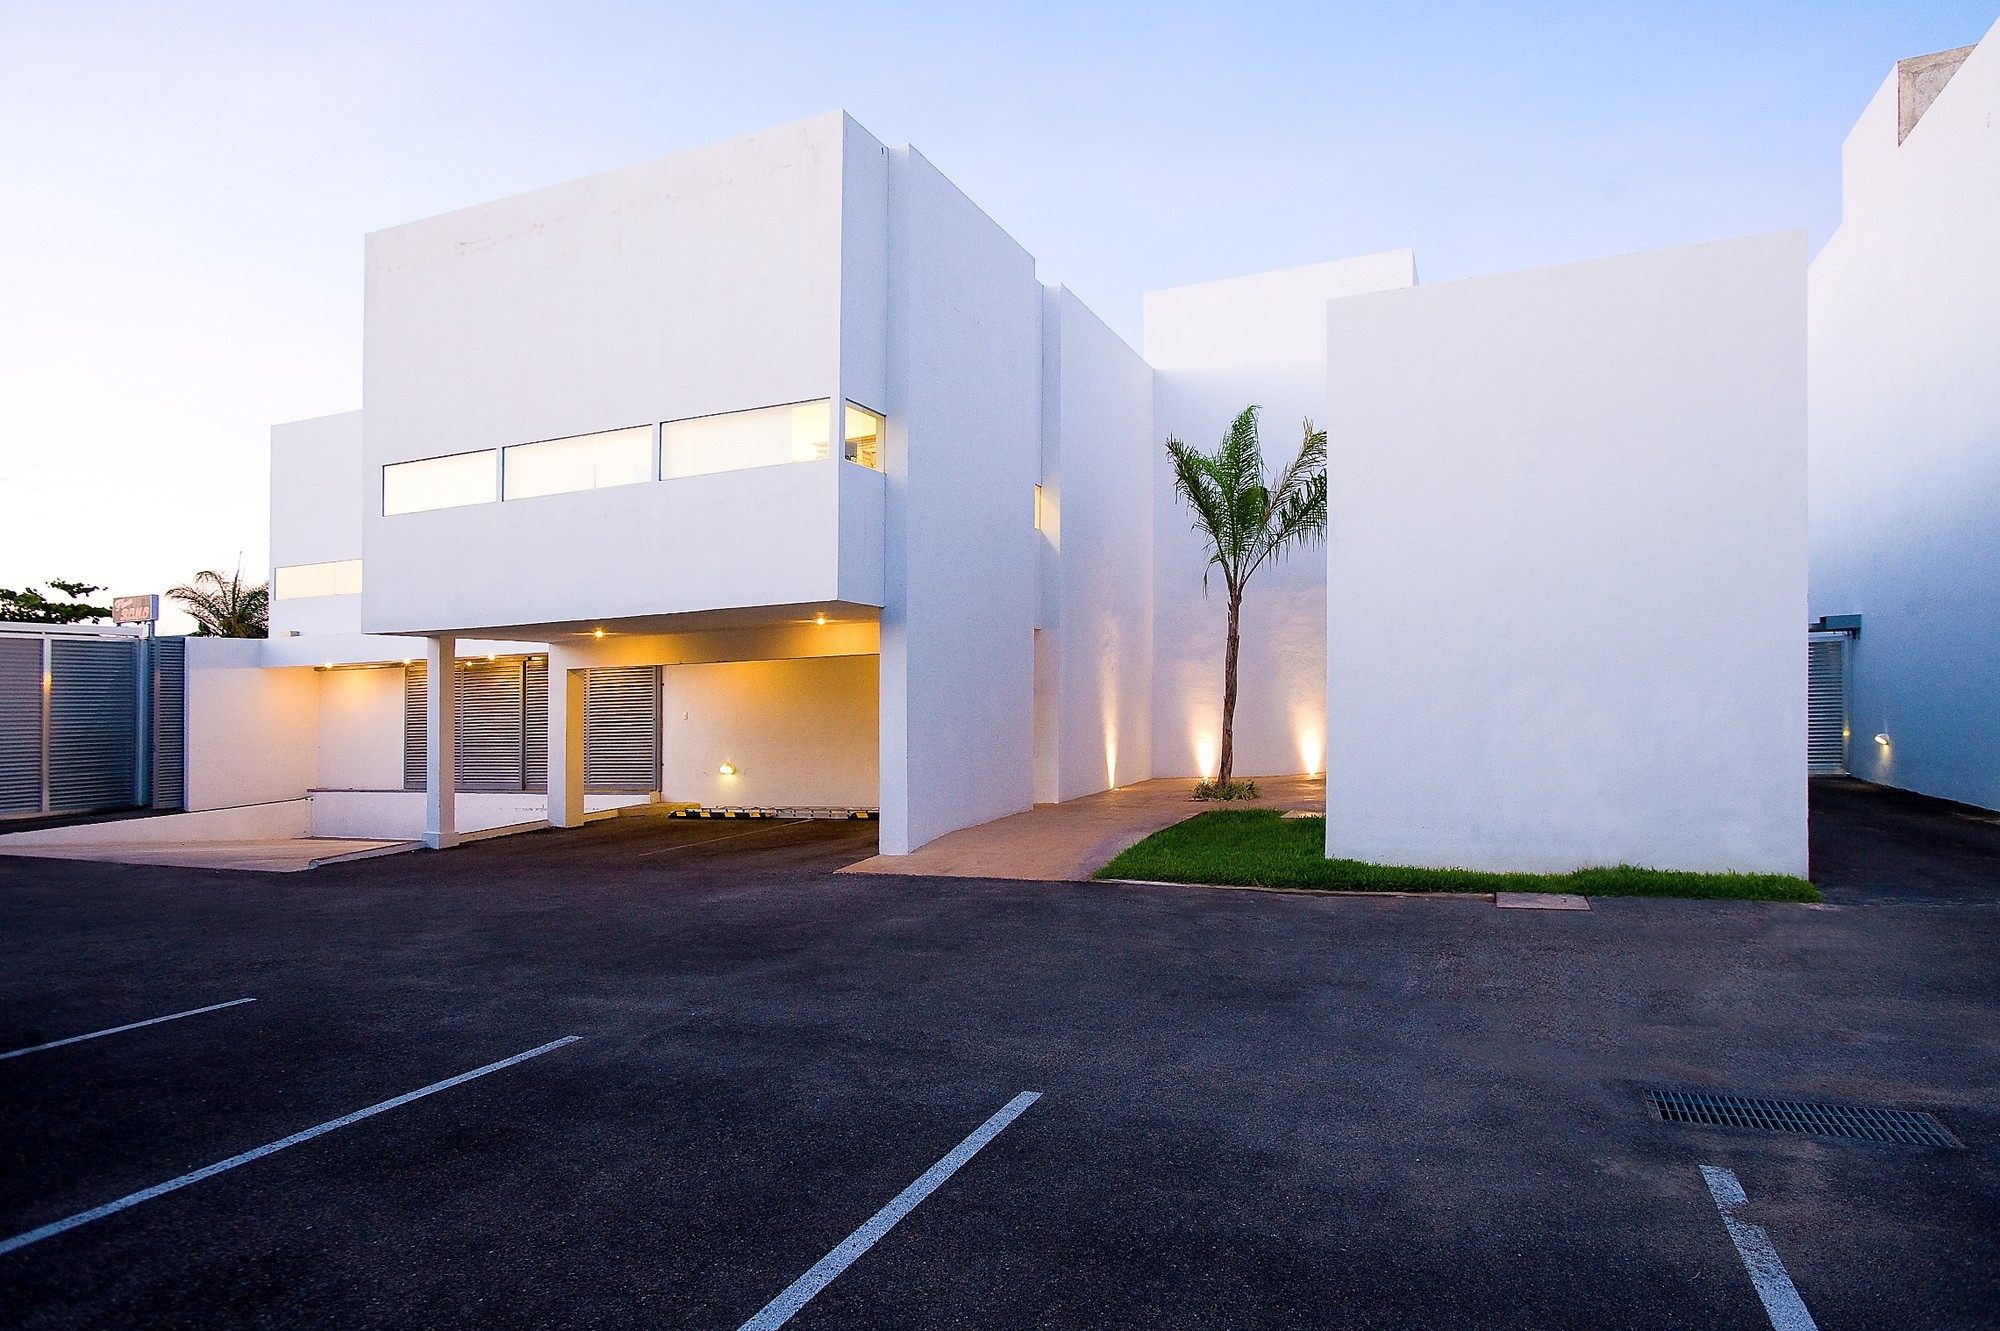 Macrocel / Seijo Peón Arquitectos